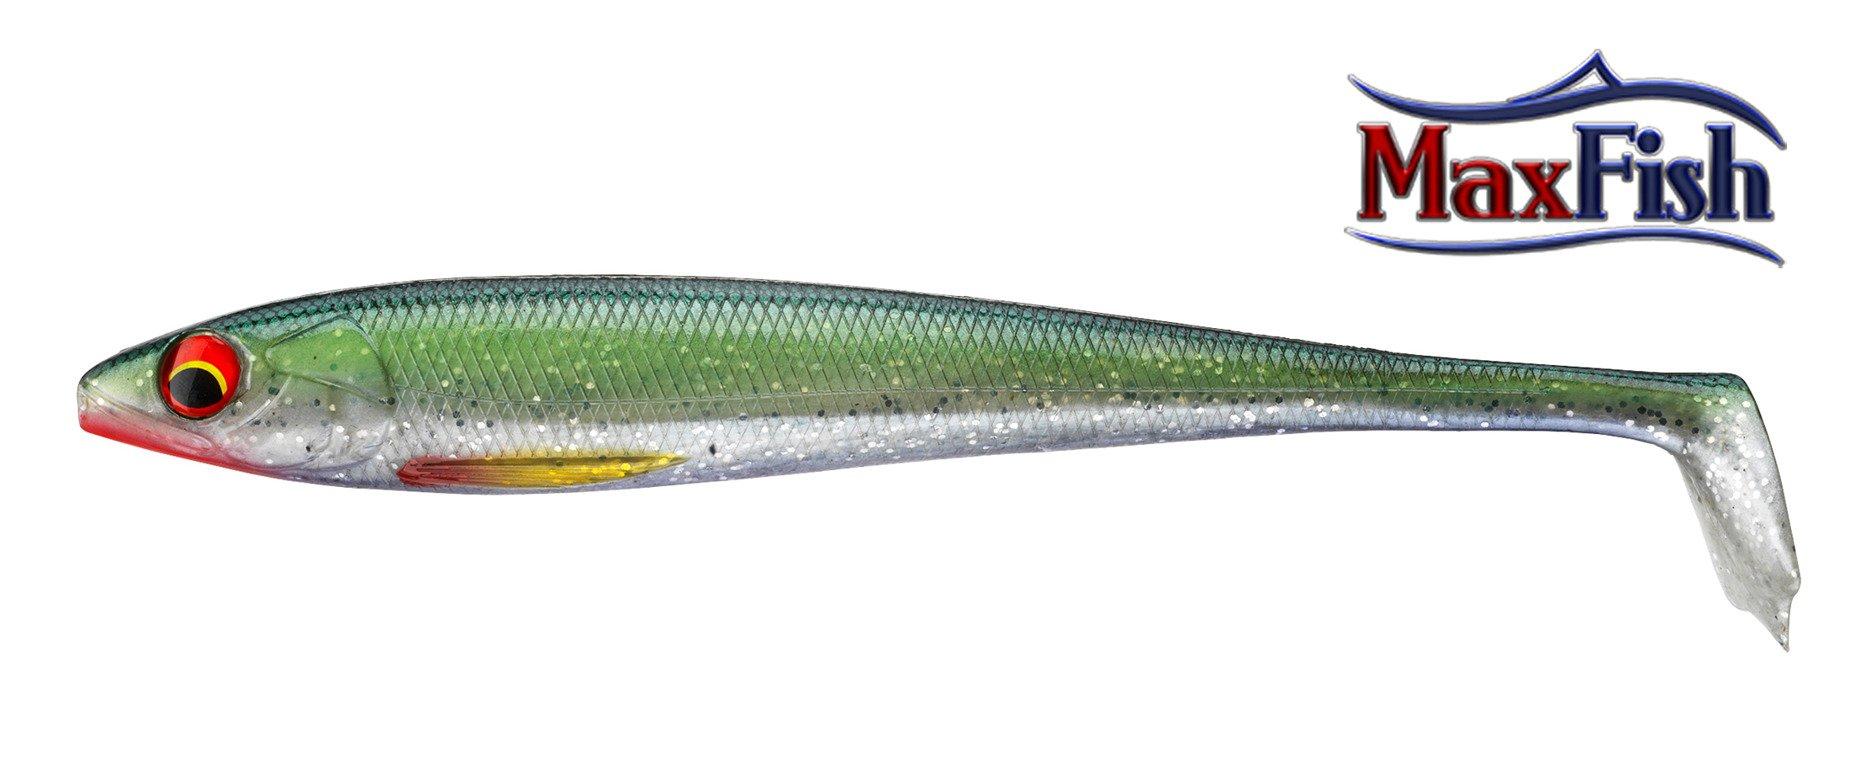 Daiwa Prorex Duckfin Shad XL - 25cm Ruegen Herring